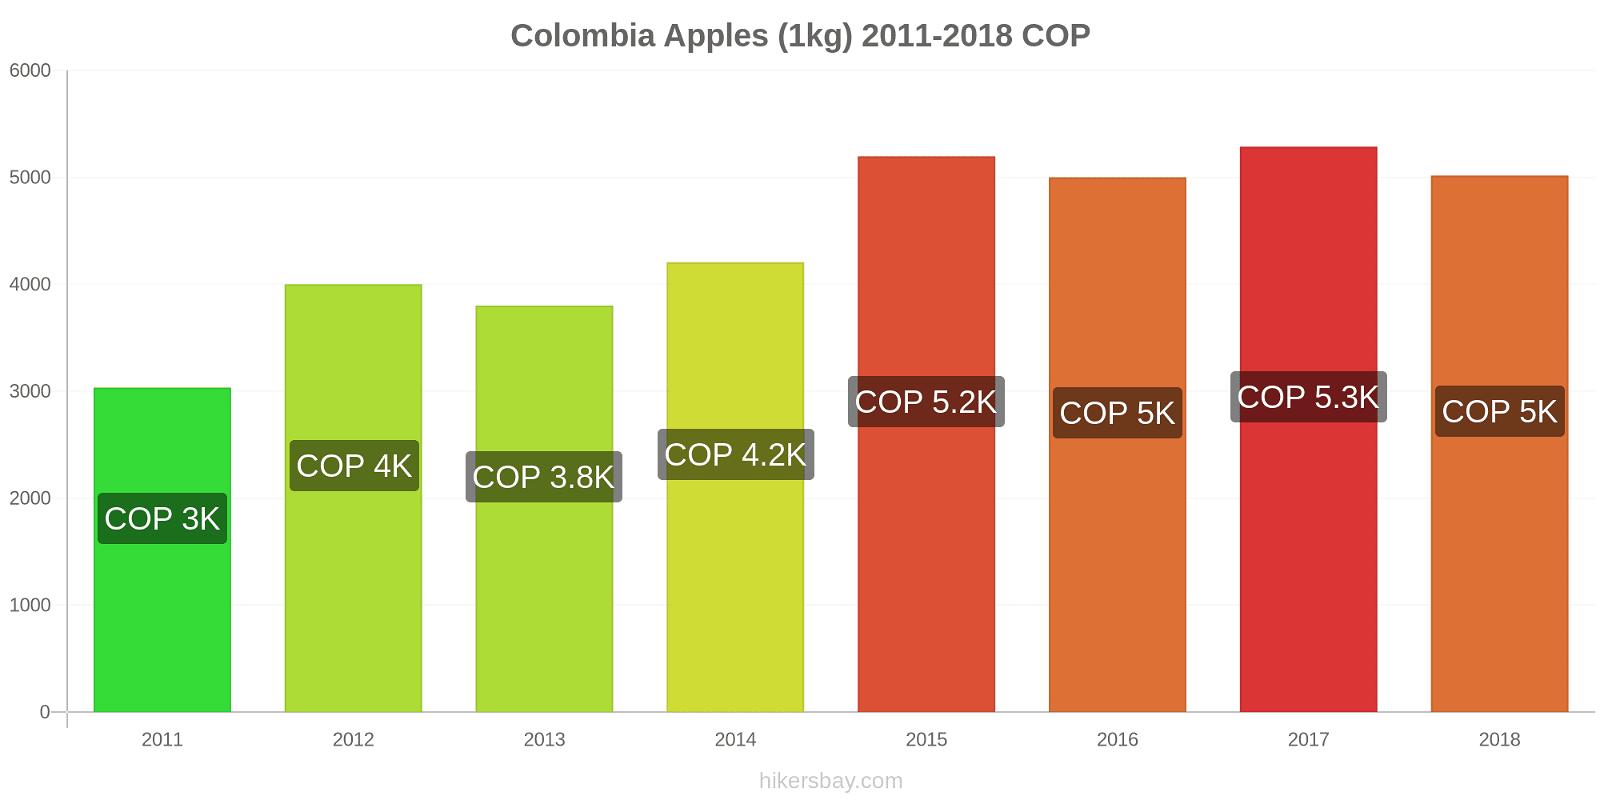 Colombia price changes Apples (1kg) hikersbay.com